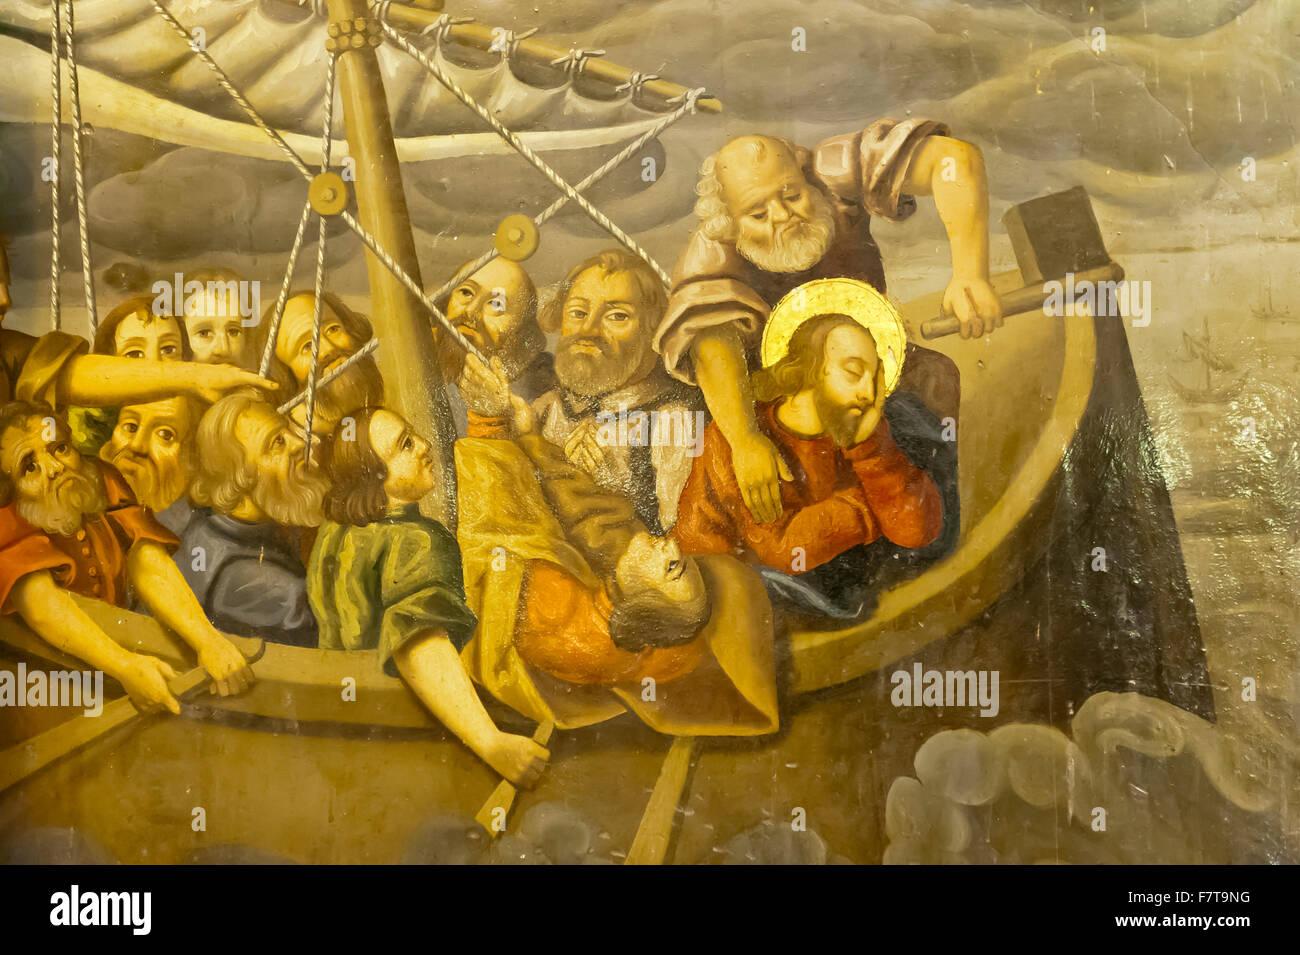 Jesus Mural Stock Photos & Jesus Mural Stock Images - Alamy